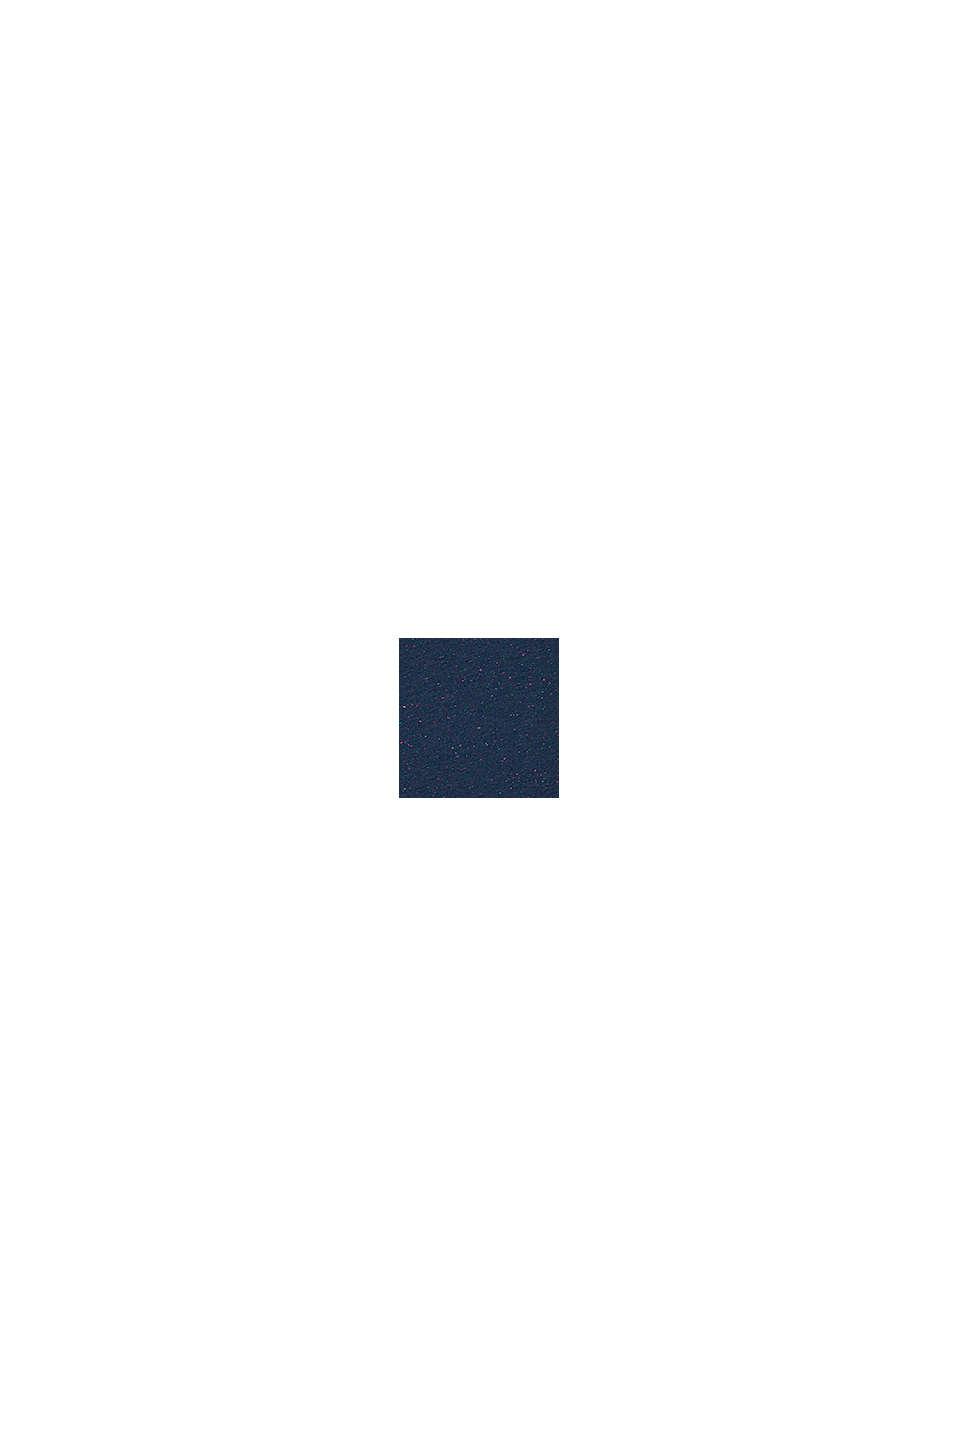 Boxy T-Shirt mit bunter Noppen-Struktur, PETROL BLUE, swatch